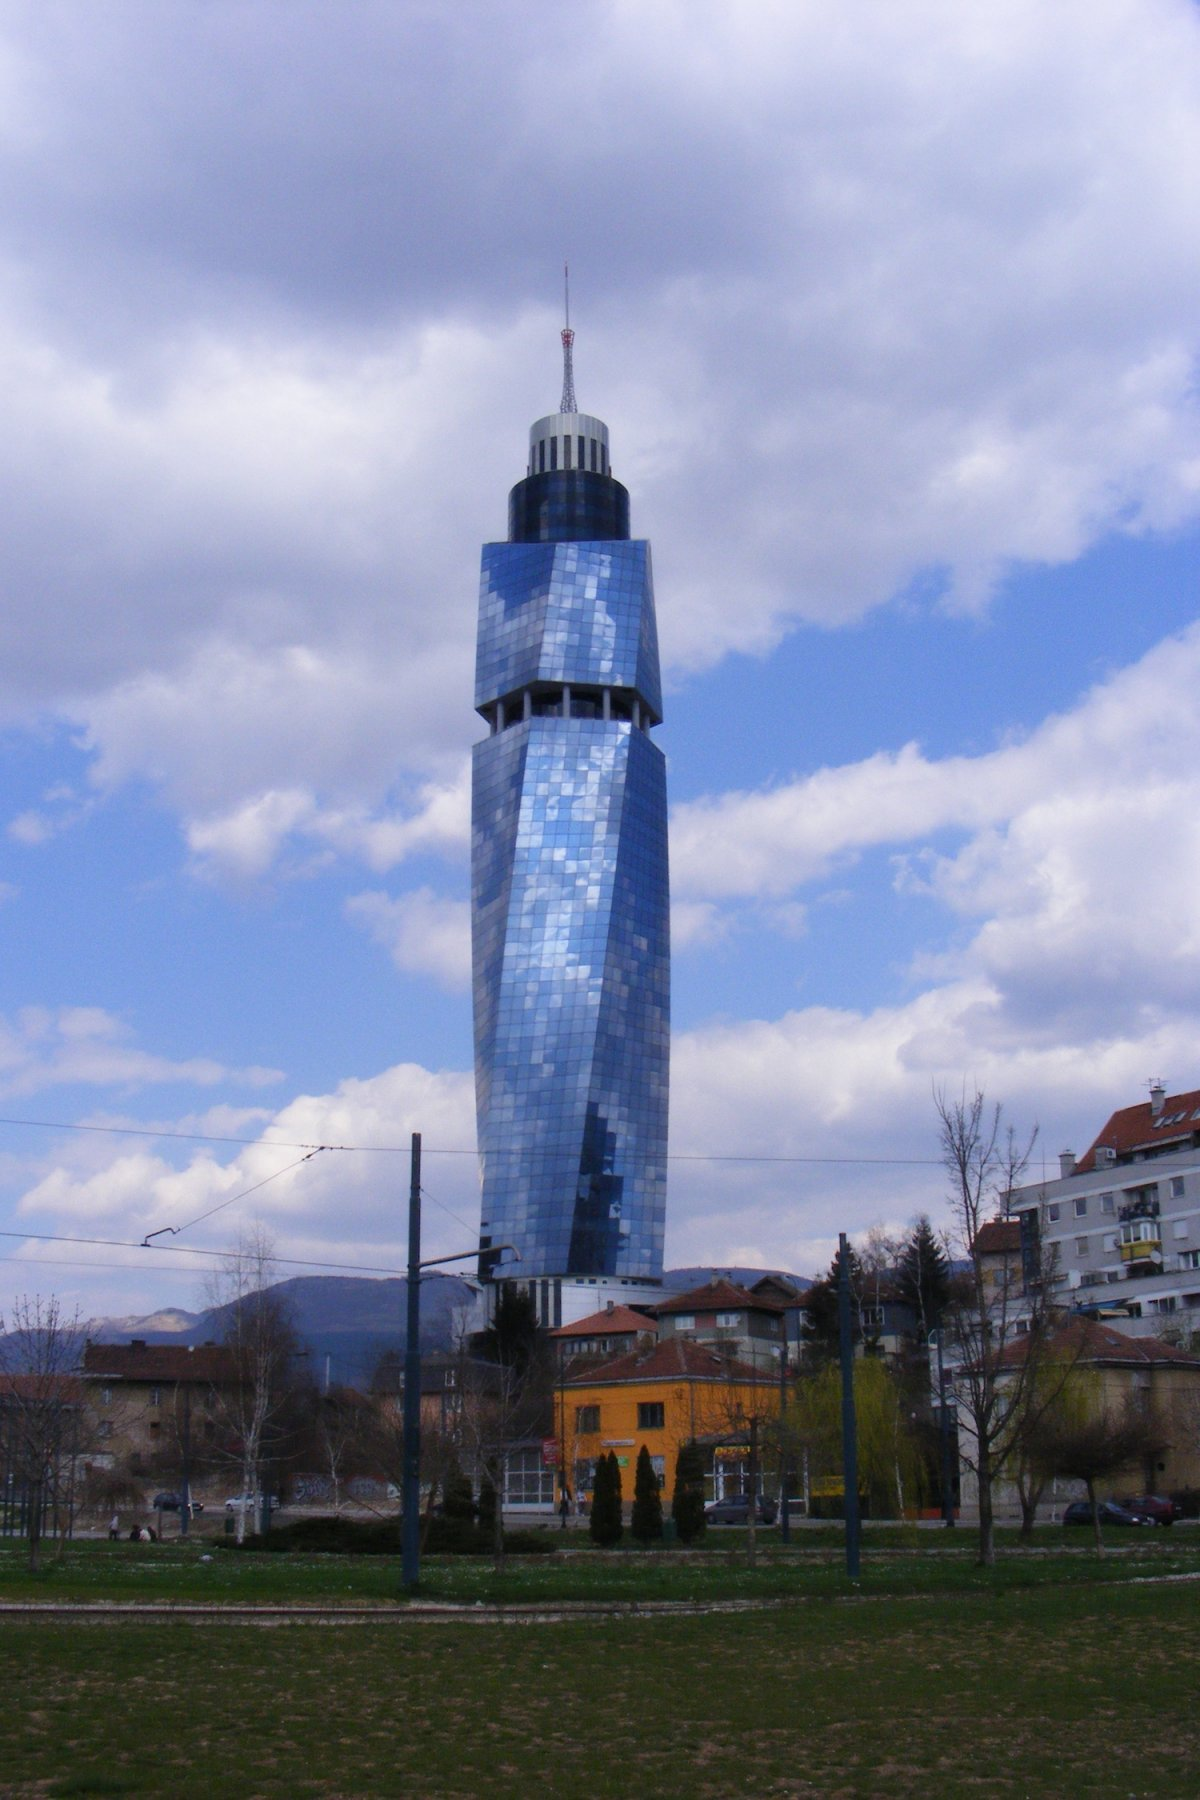 Аваз Твист (Сараево, Босния и Герцеговина). Проектирование — архитектор Фарук Капиджич, ADS Group Sa